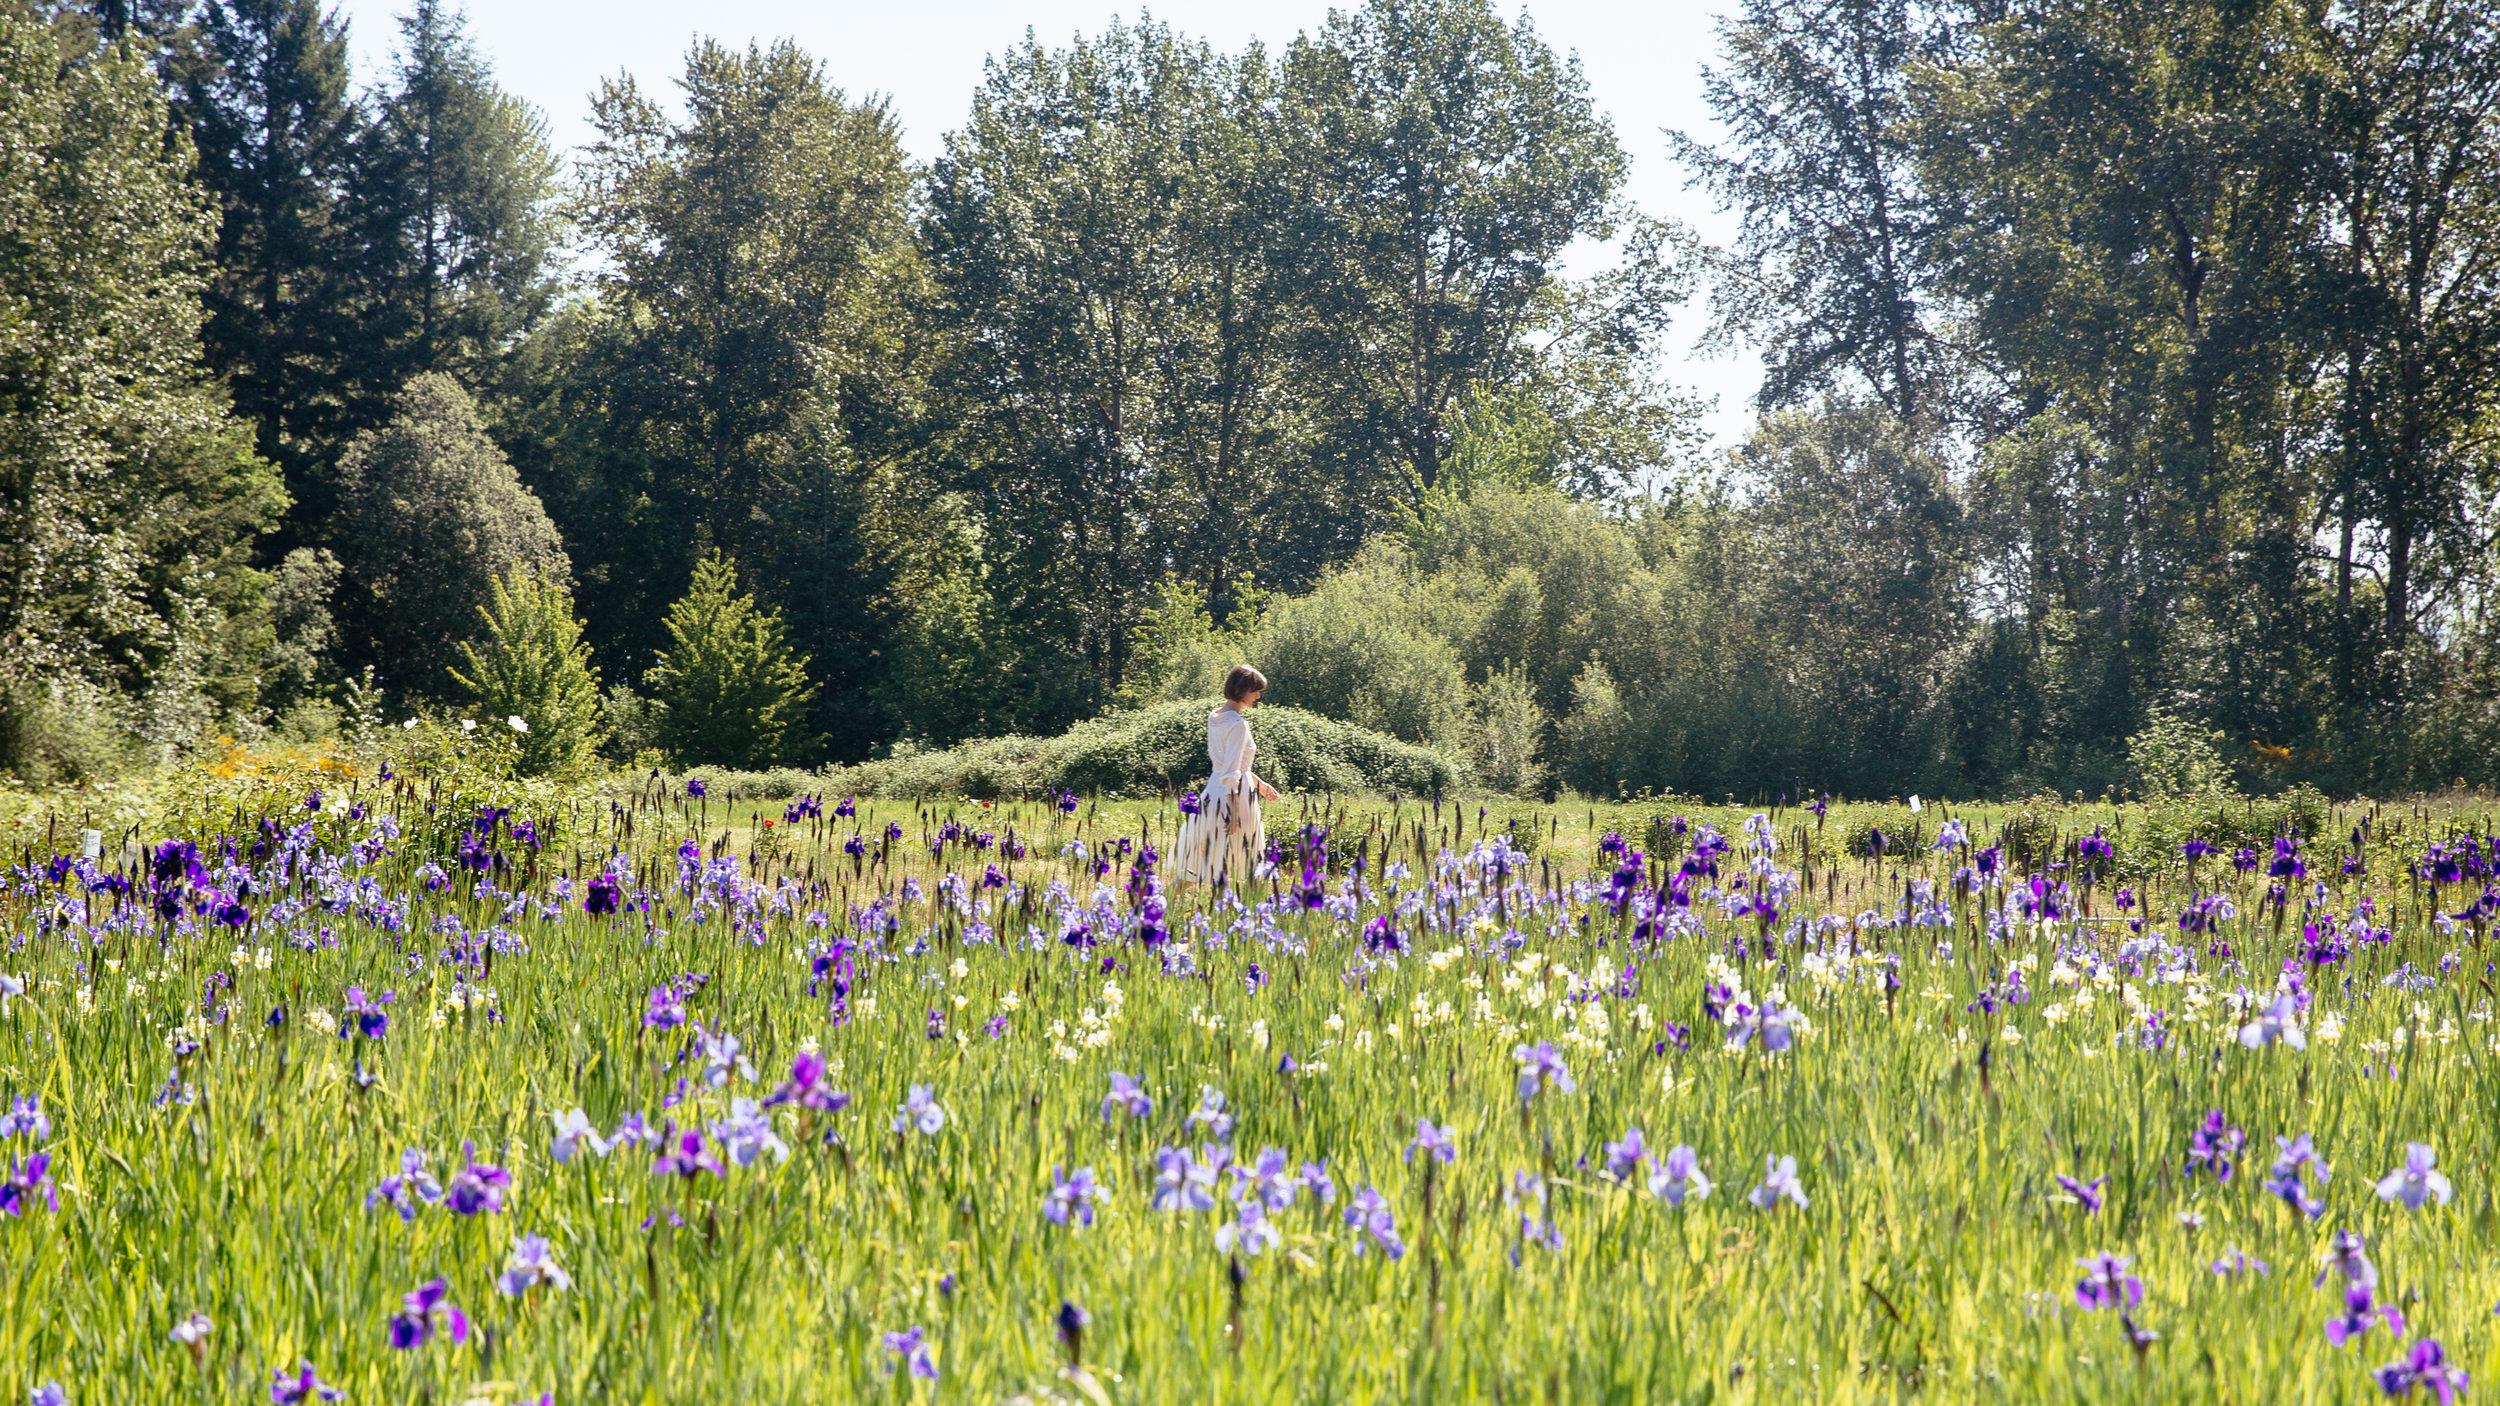 Elaine Schimek walking through an iris field